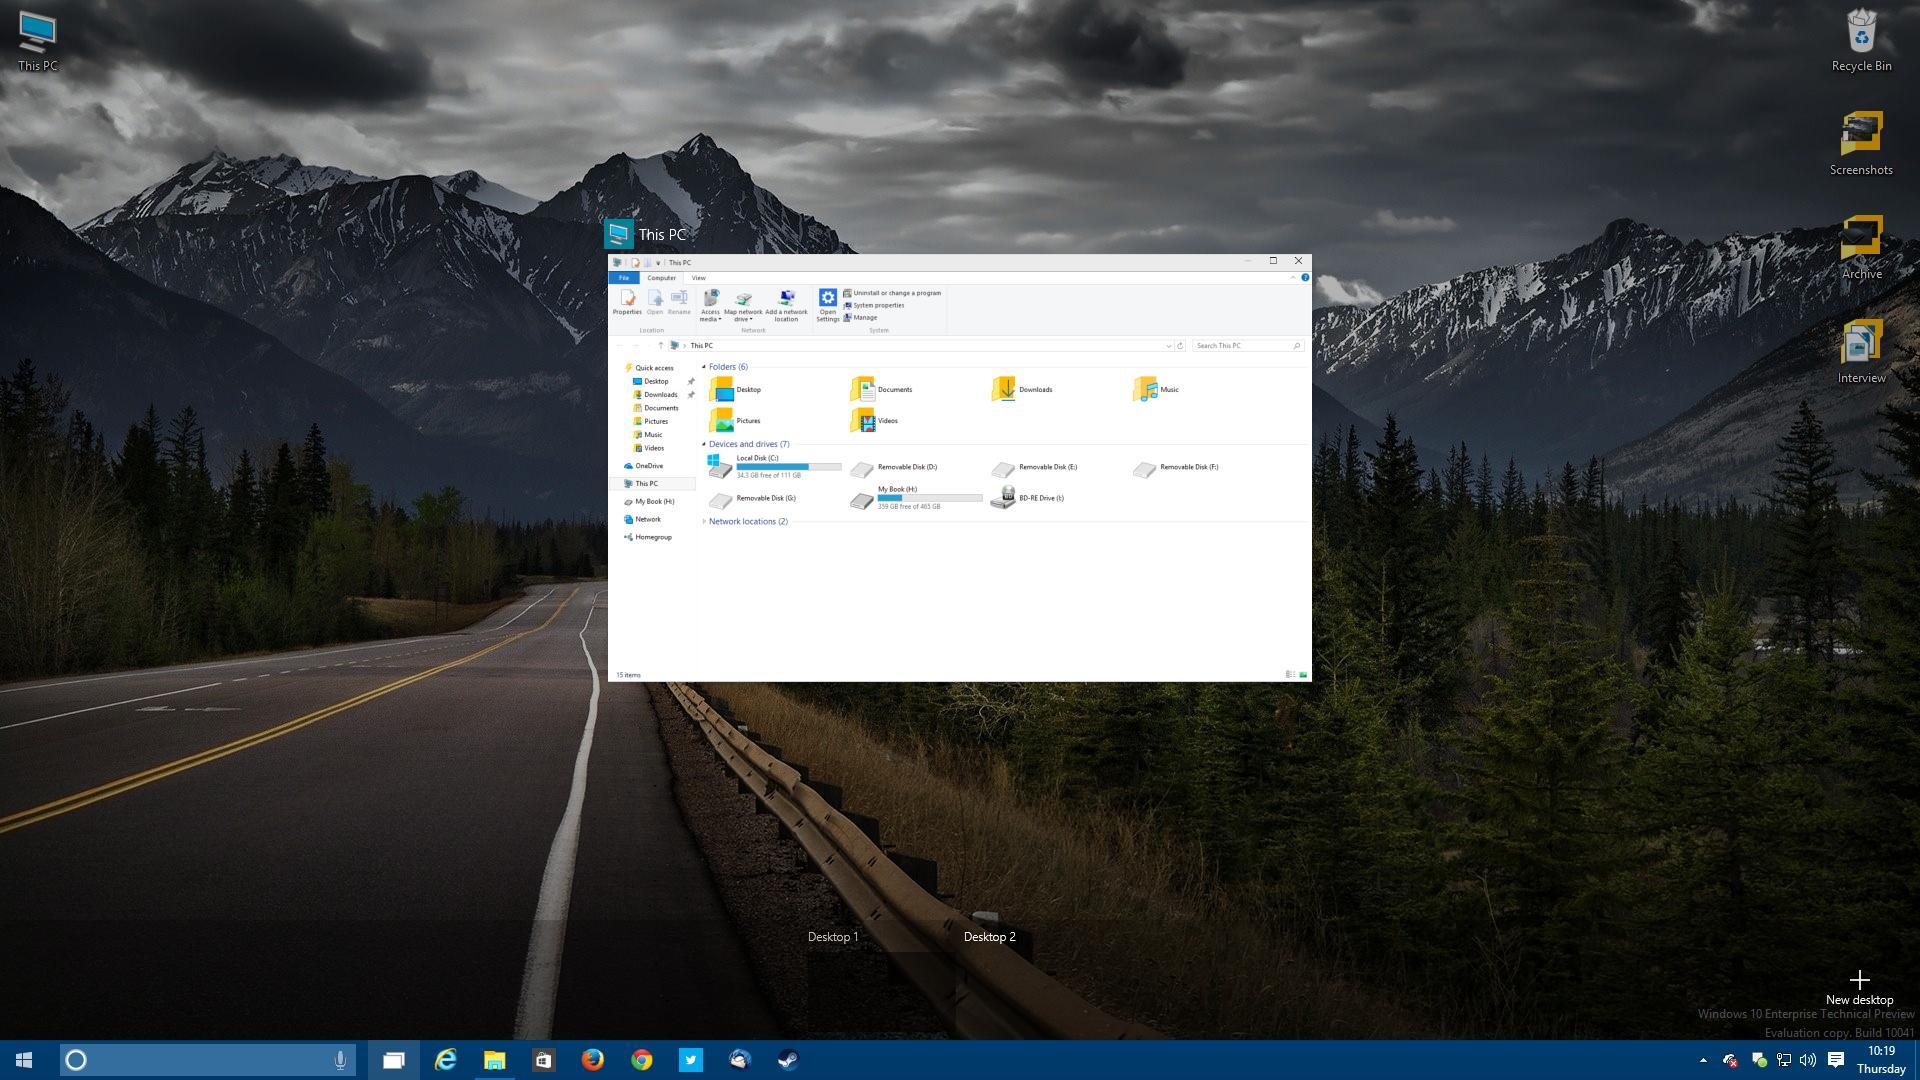 Windows 10 build 10041 photo gallery windows 10 build 10041 file explorer ccuart Gallery